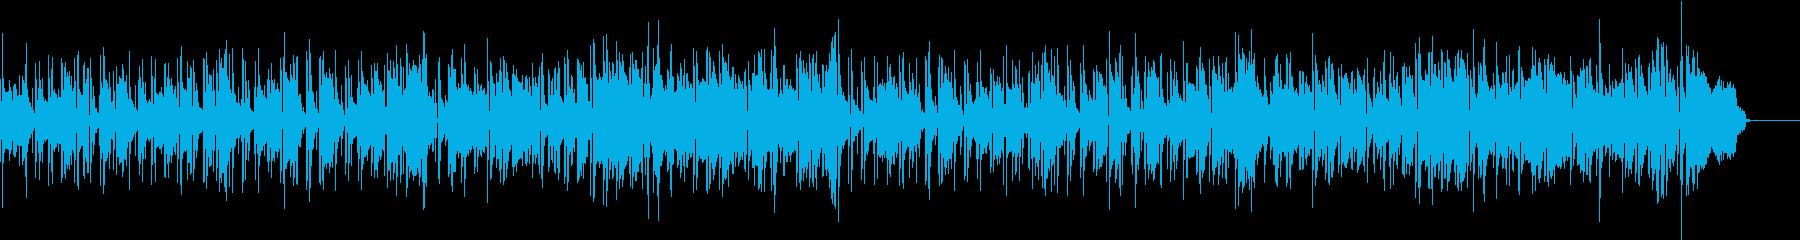 saxでボサノバの再生済みの波形